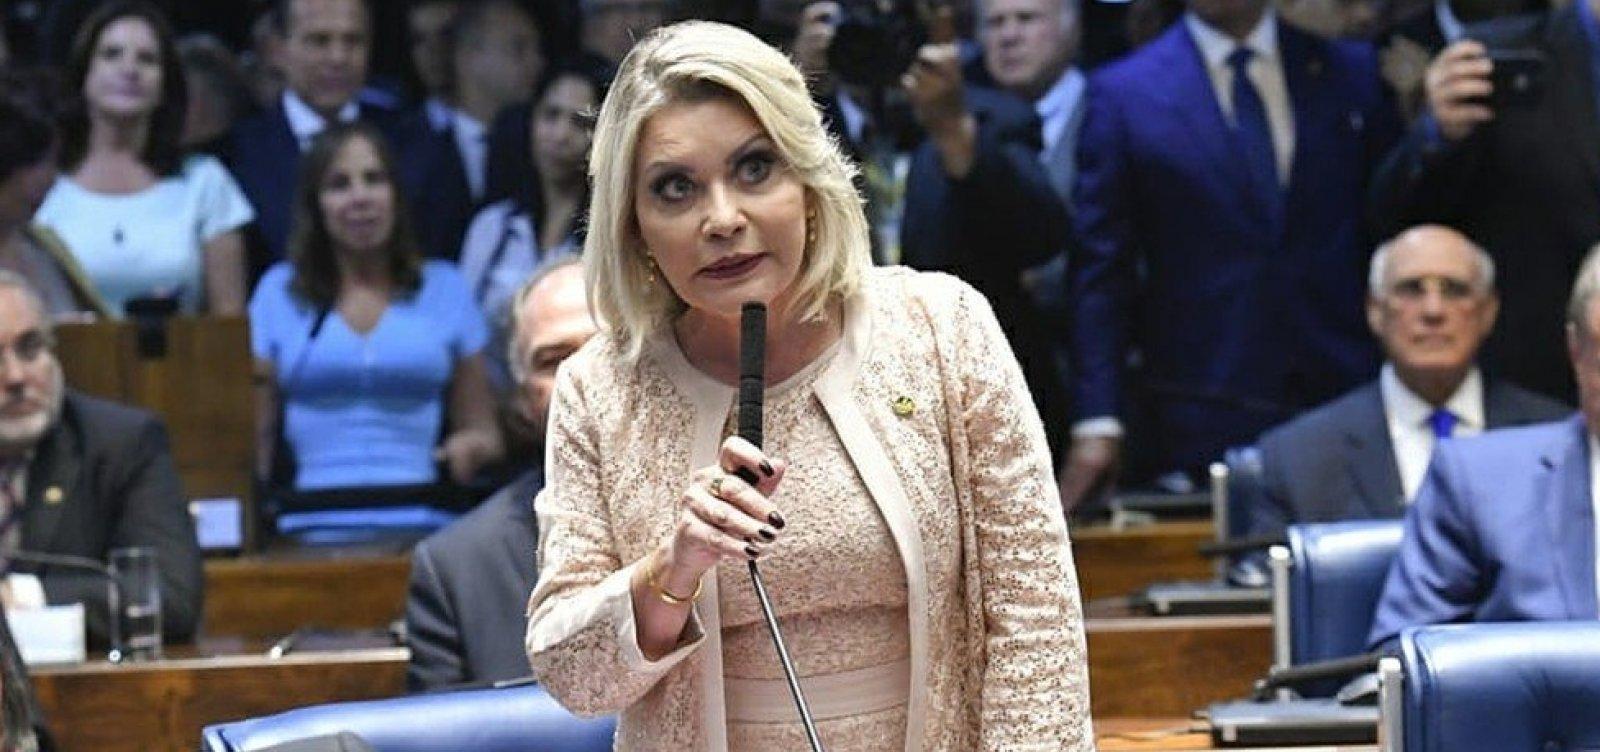 ['Moro de saias', senadora do PSL é cassada]